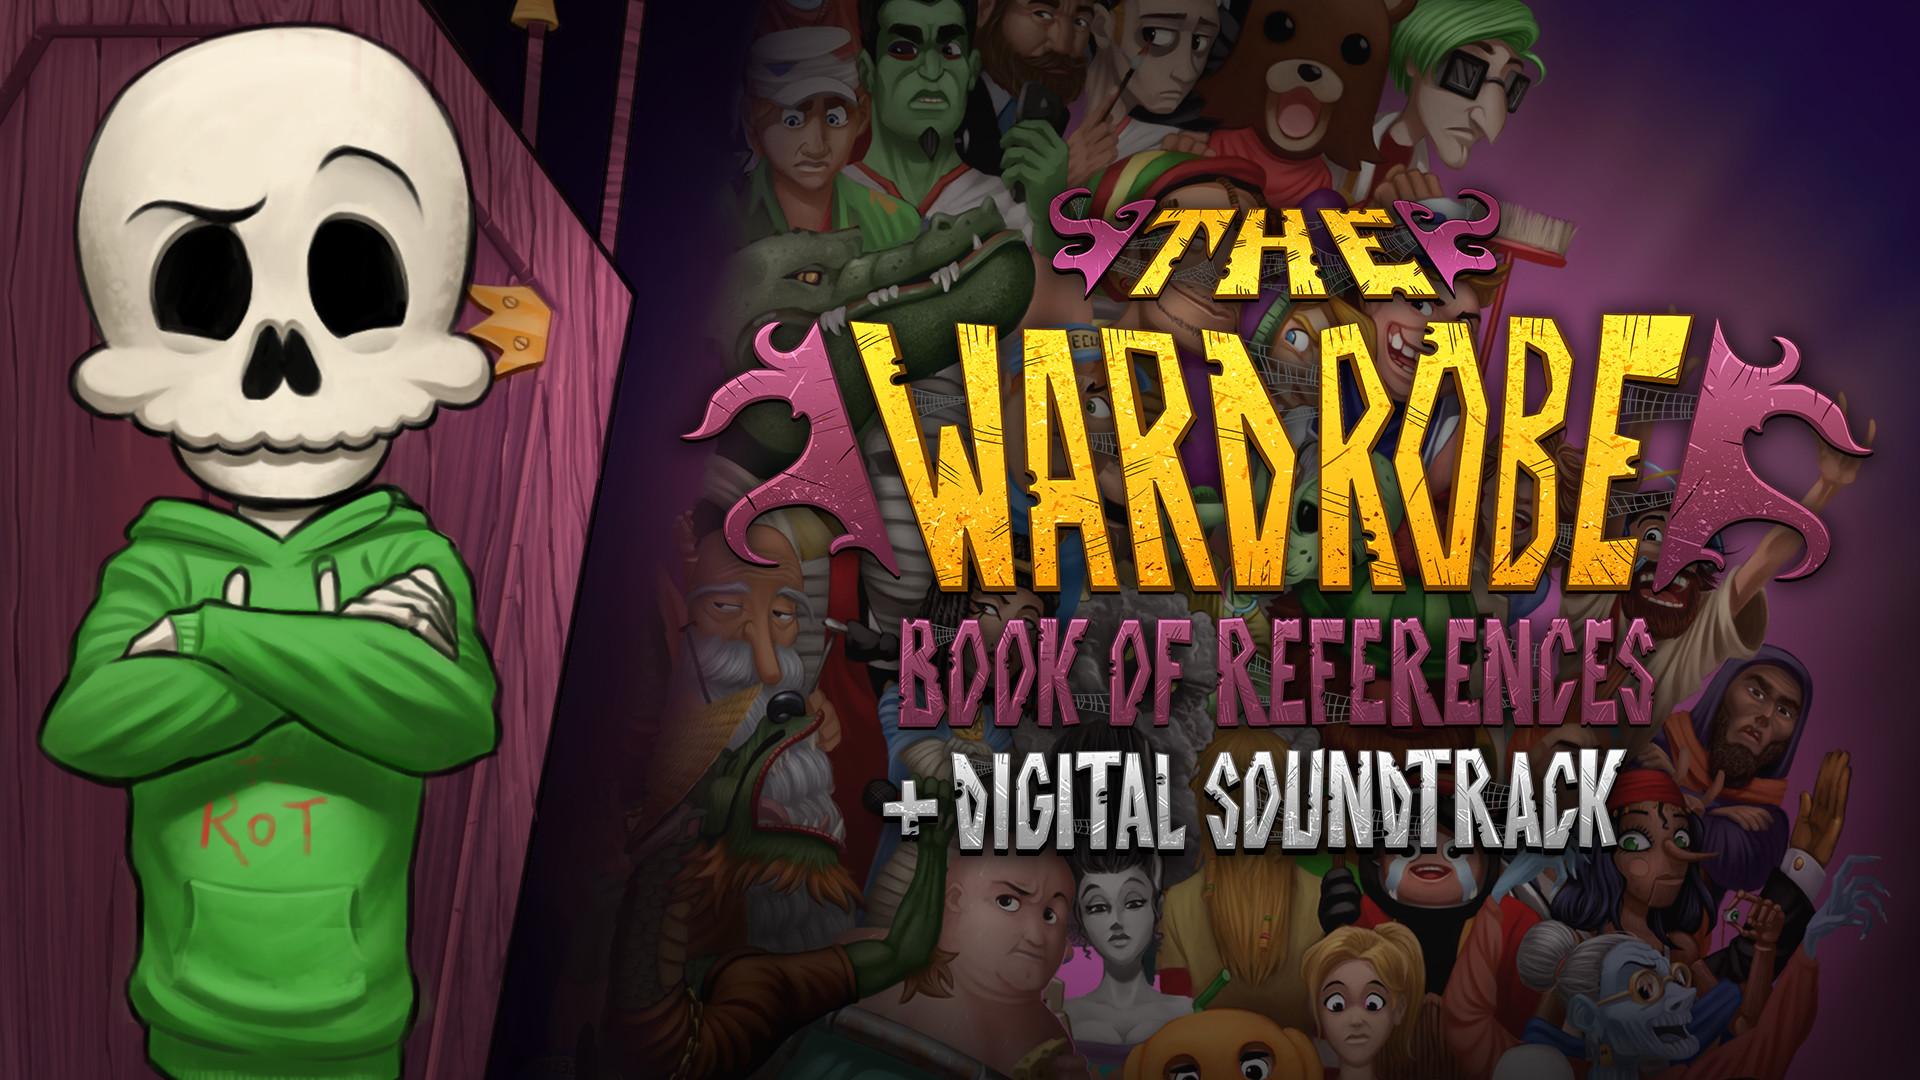 The Wardrobe - Book of References + Digital Soundtrack